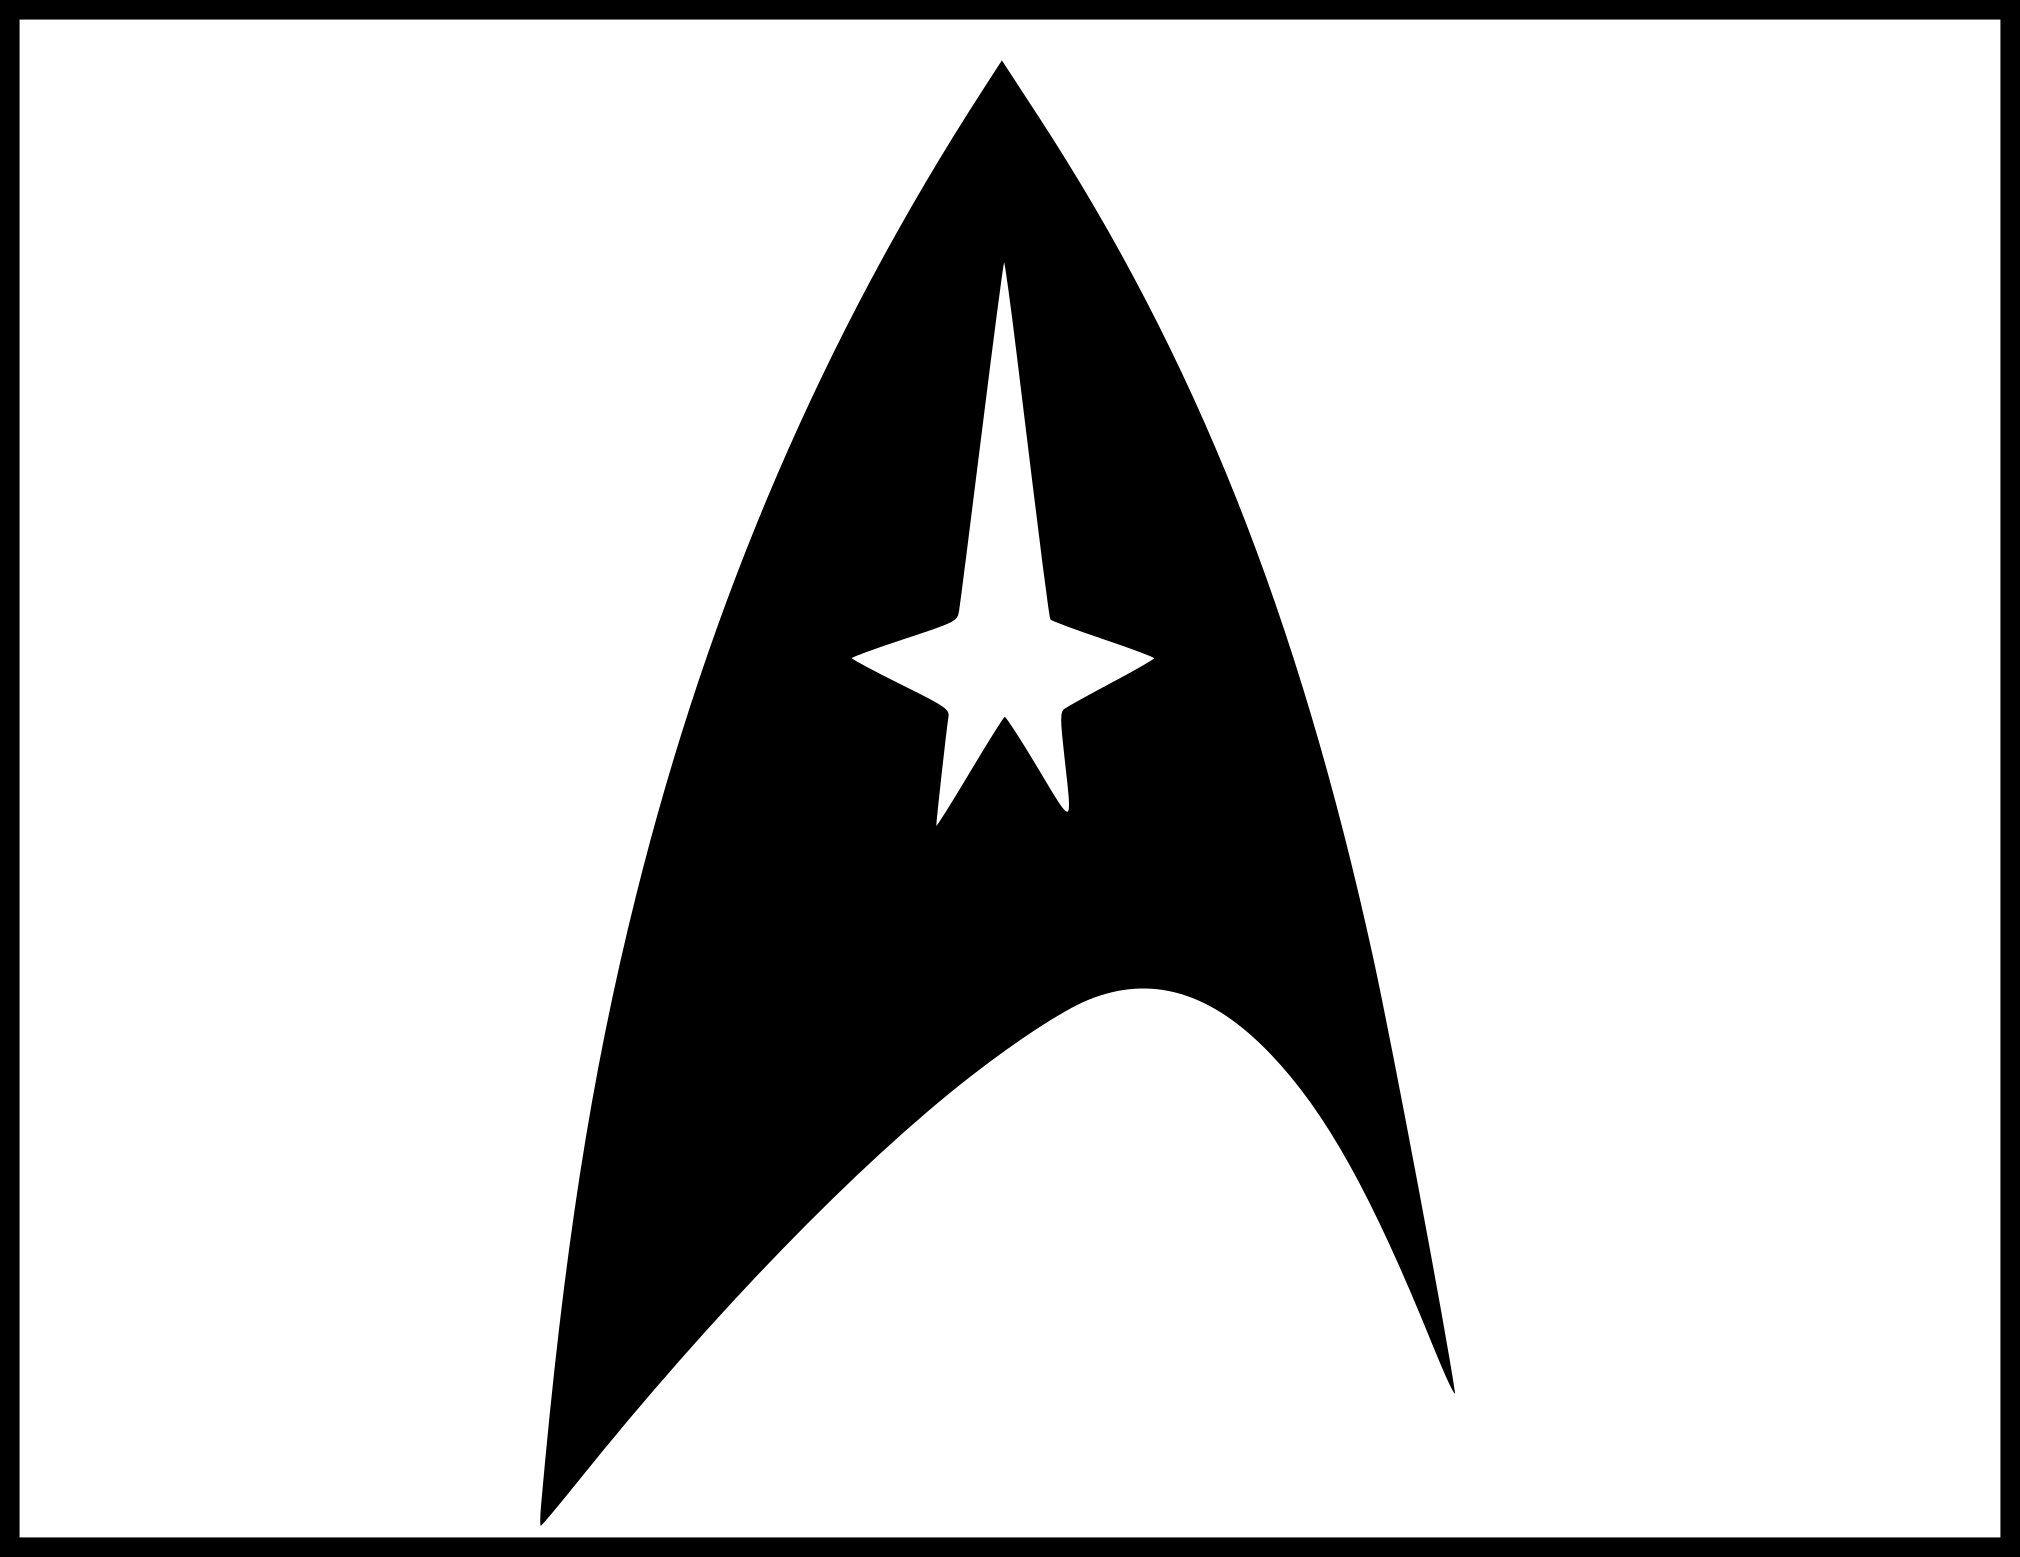 Star Trek Symbol Svg Png Clipart Svg Files For Cricut Laser Etsy Star Trek Symbol Svg Files For Cricut Clip Art